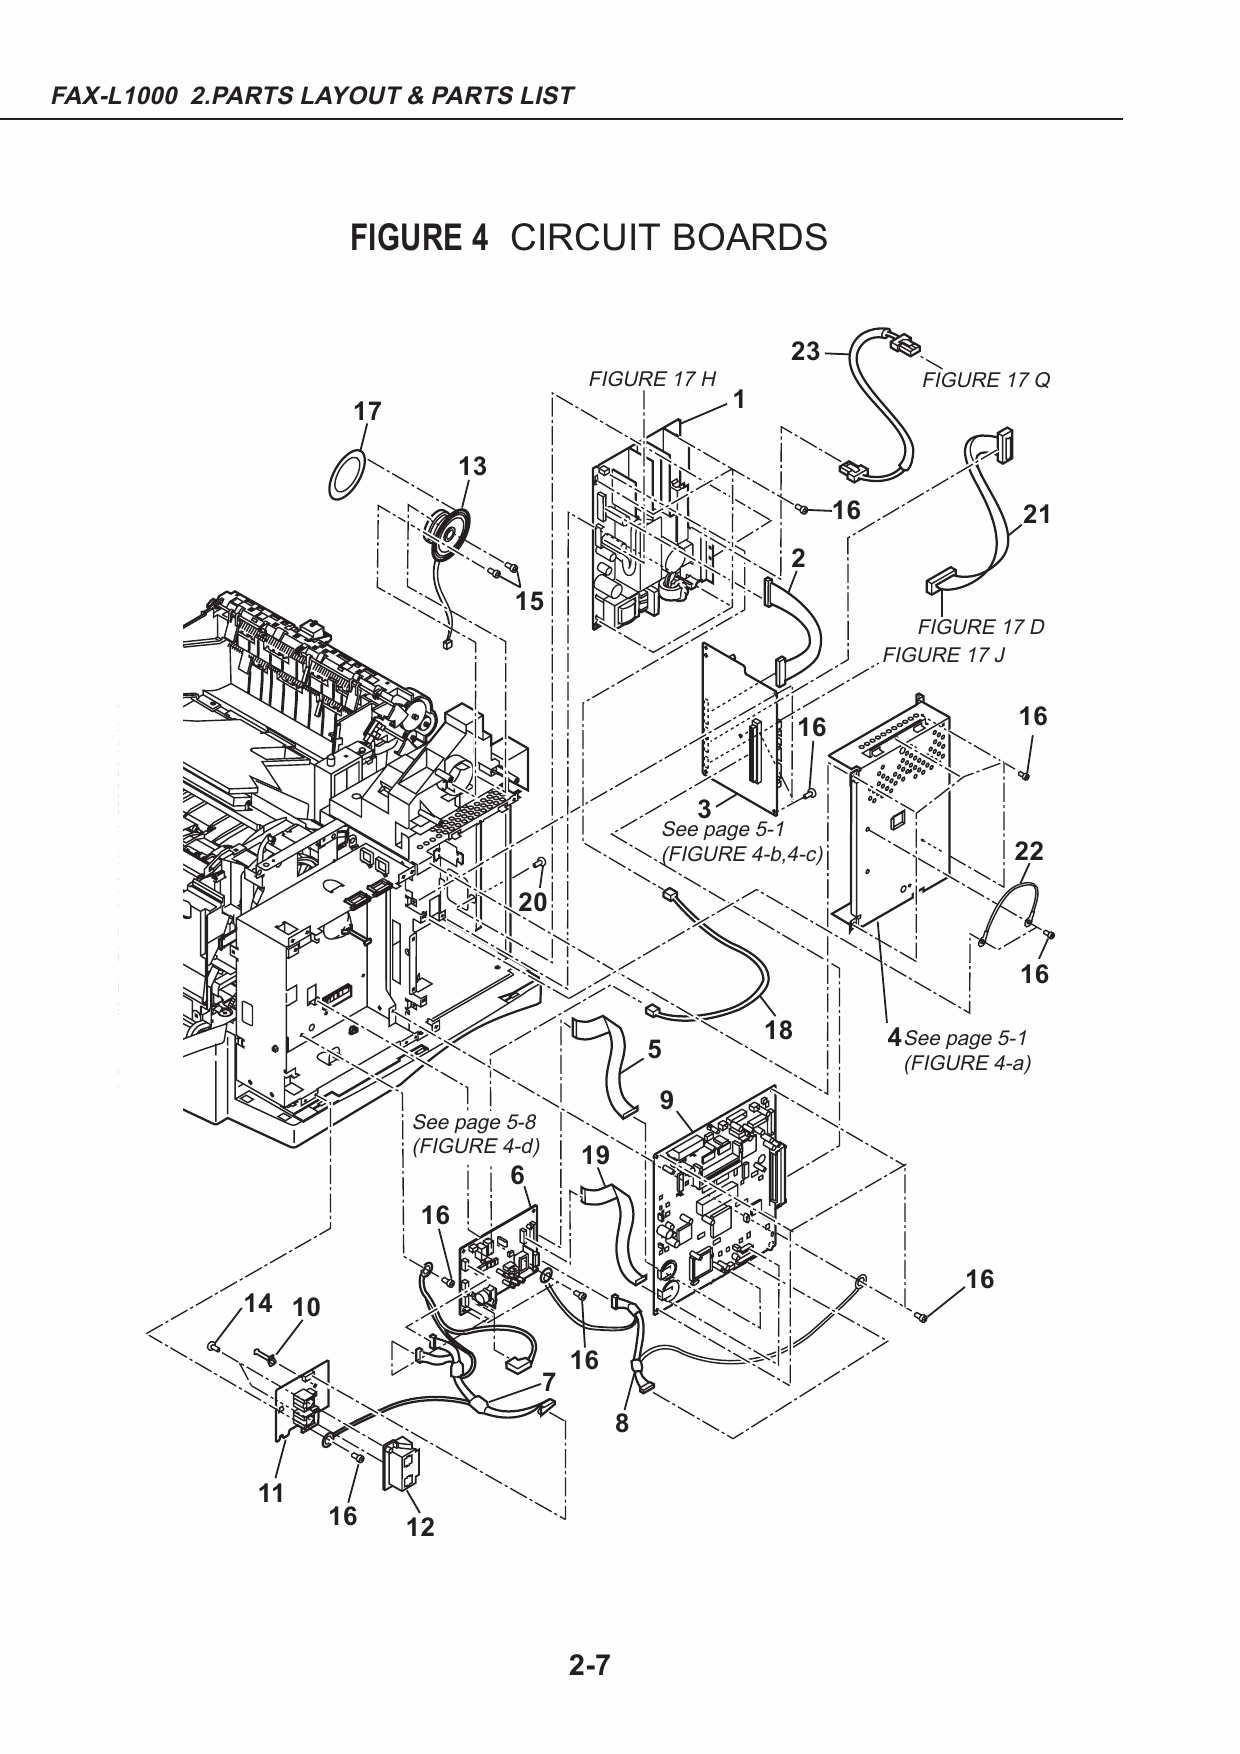 Canon Fax L Parts And Service Manual